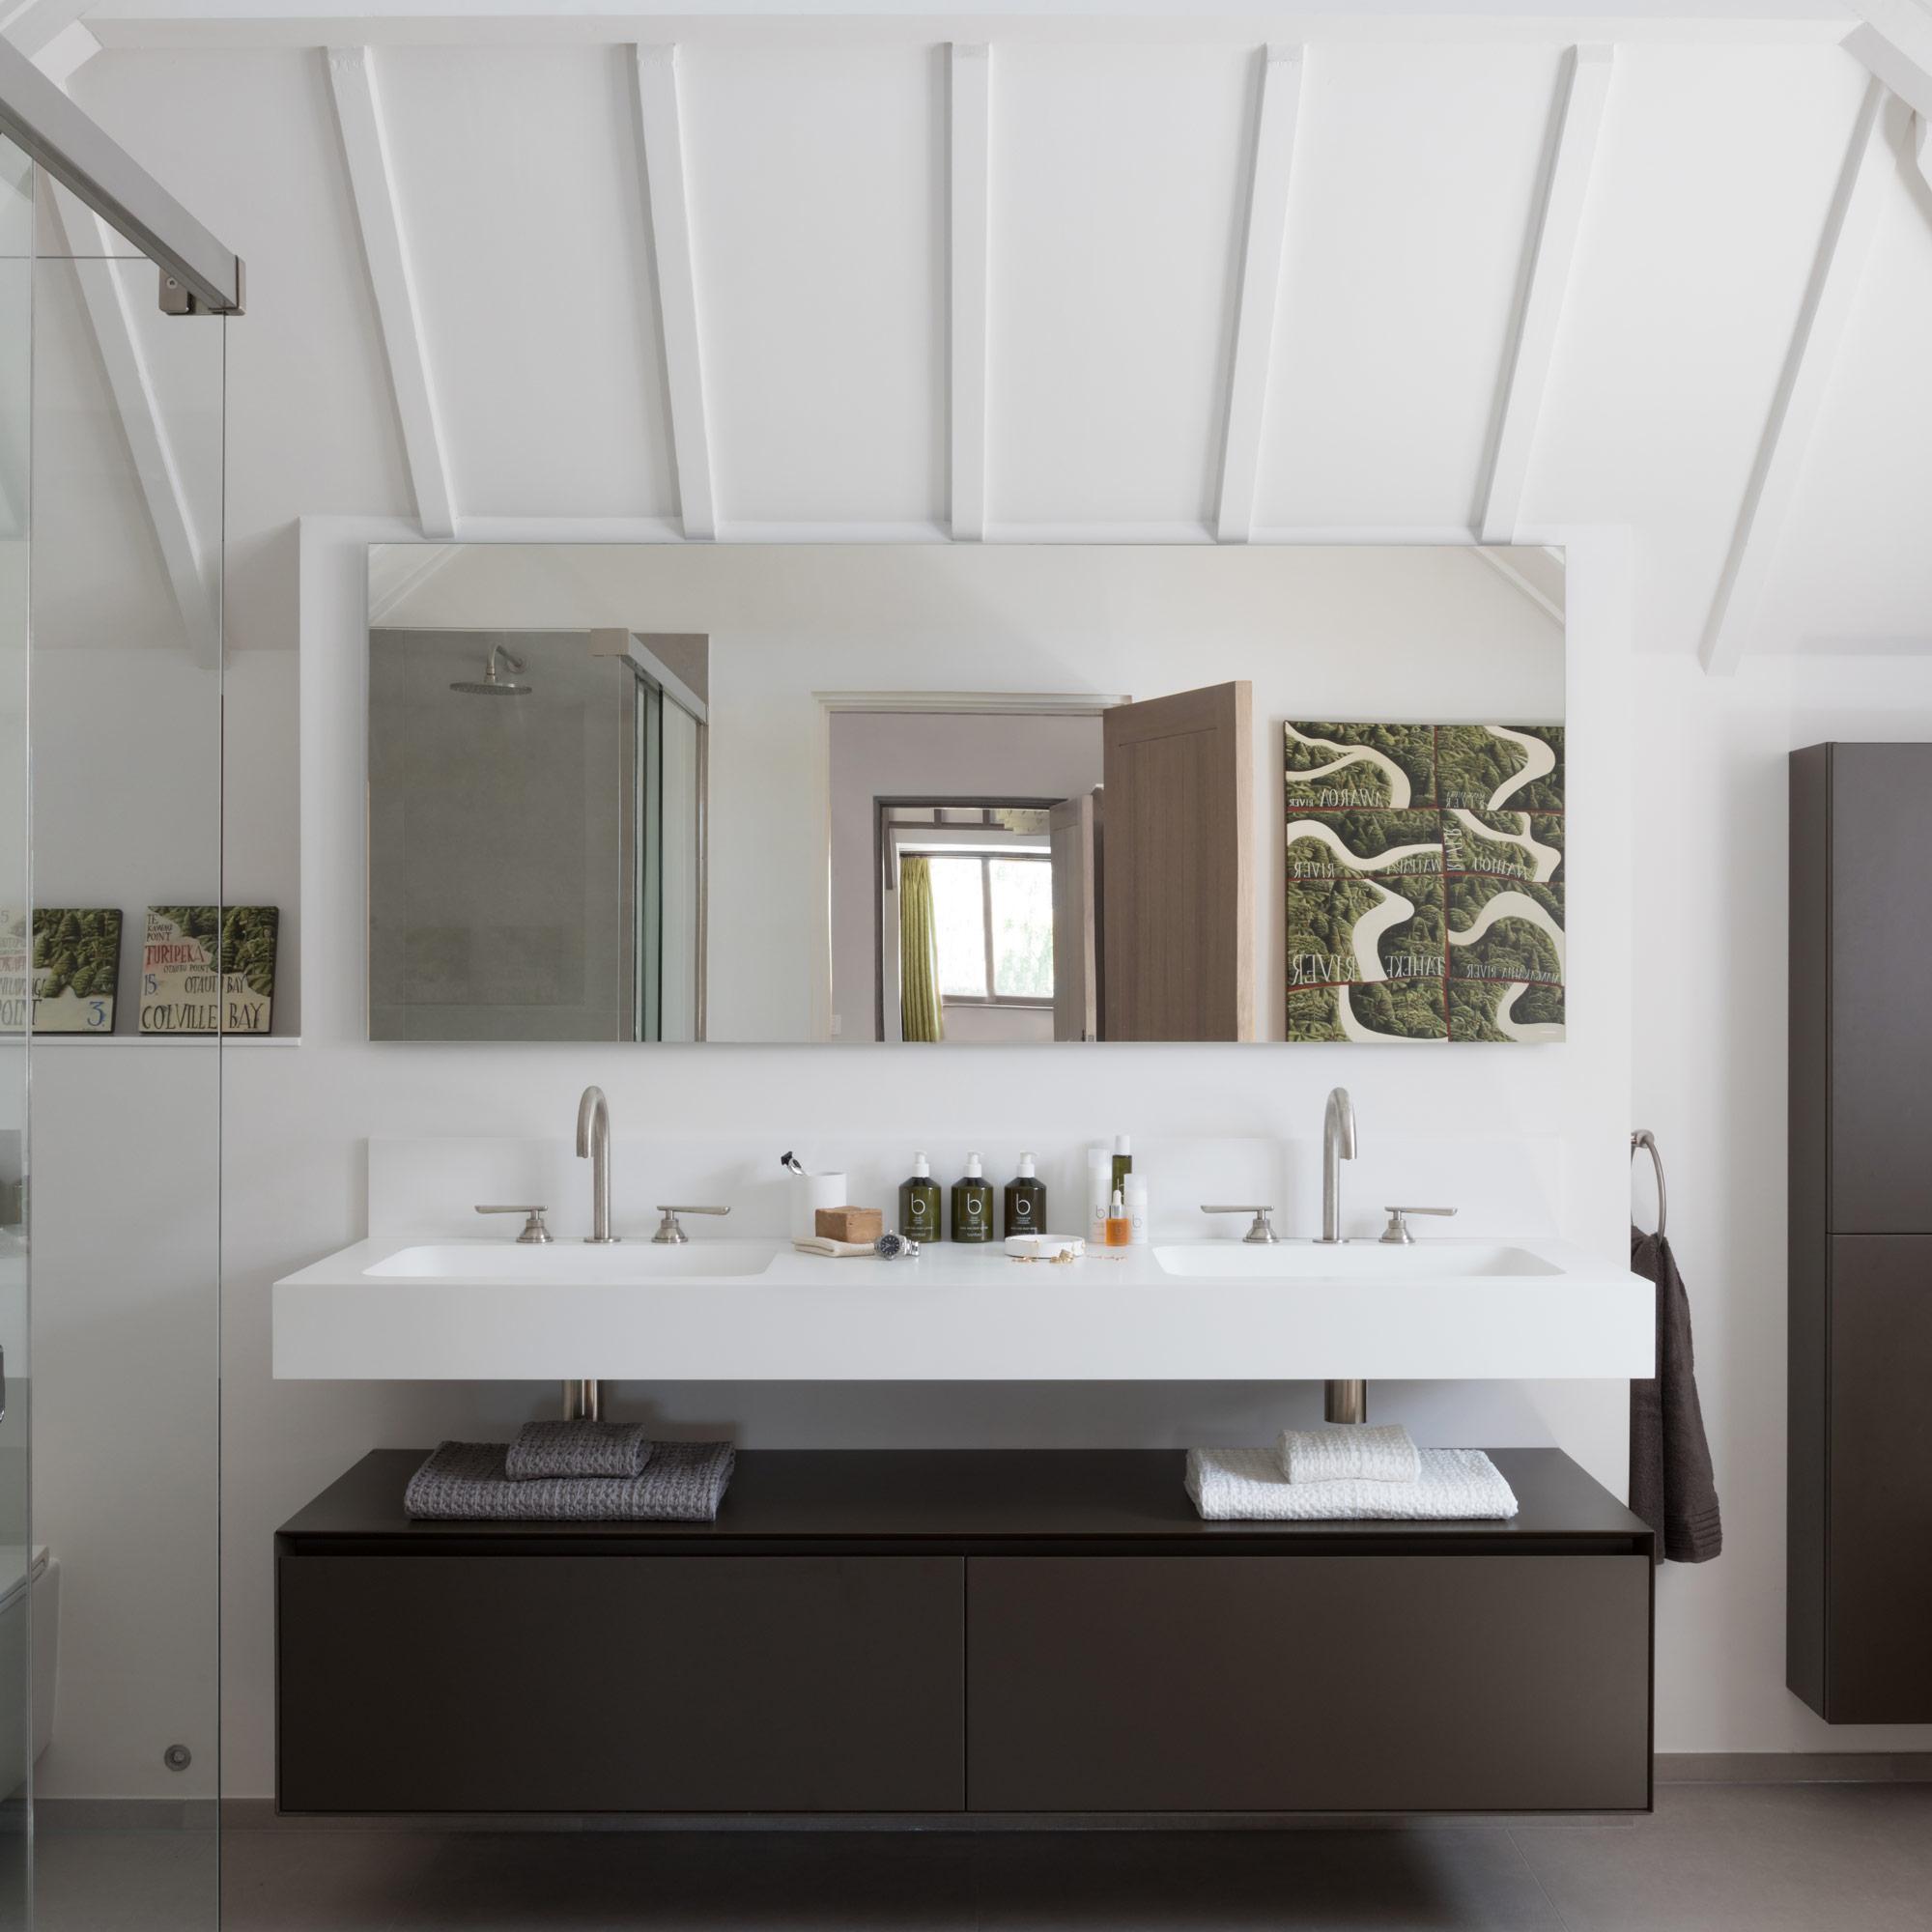 Bathroom Design Case Studies | West One Bathrooms